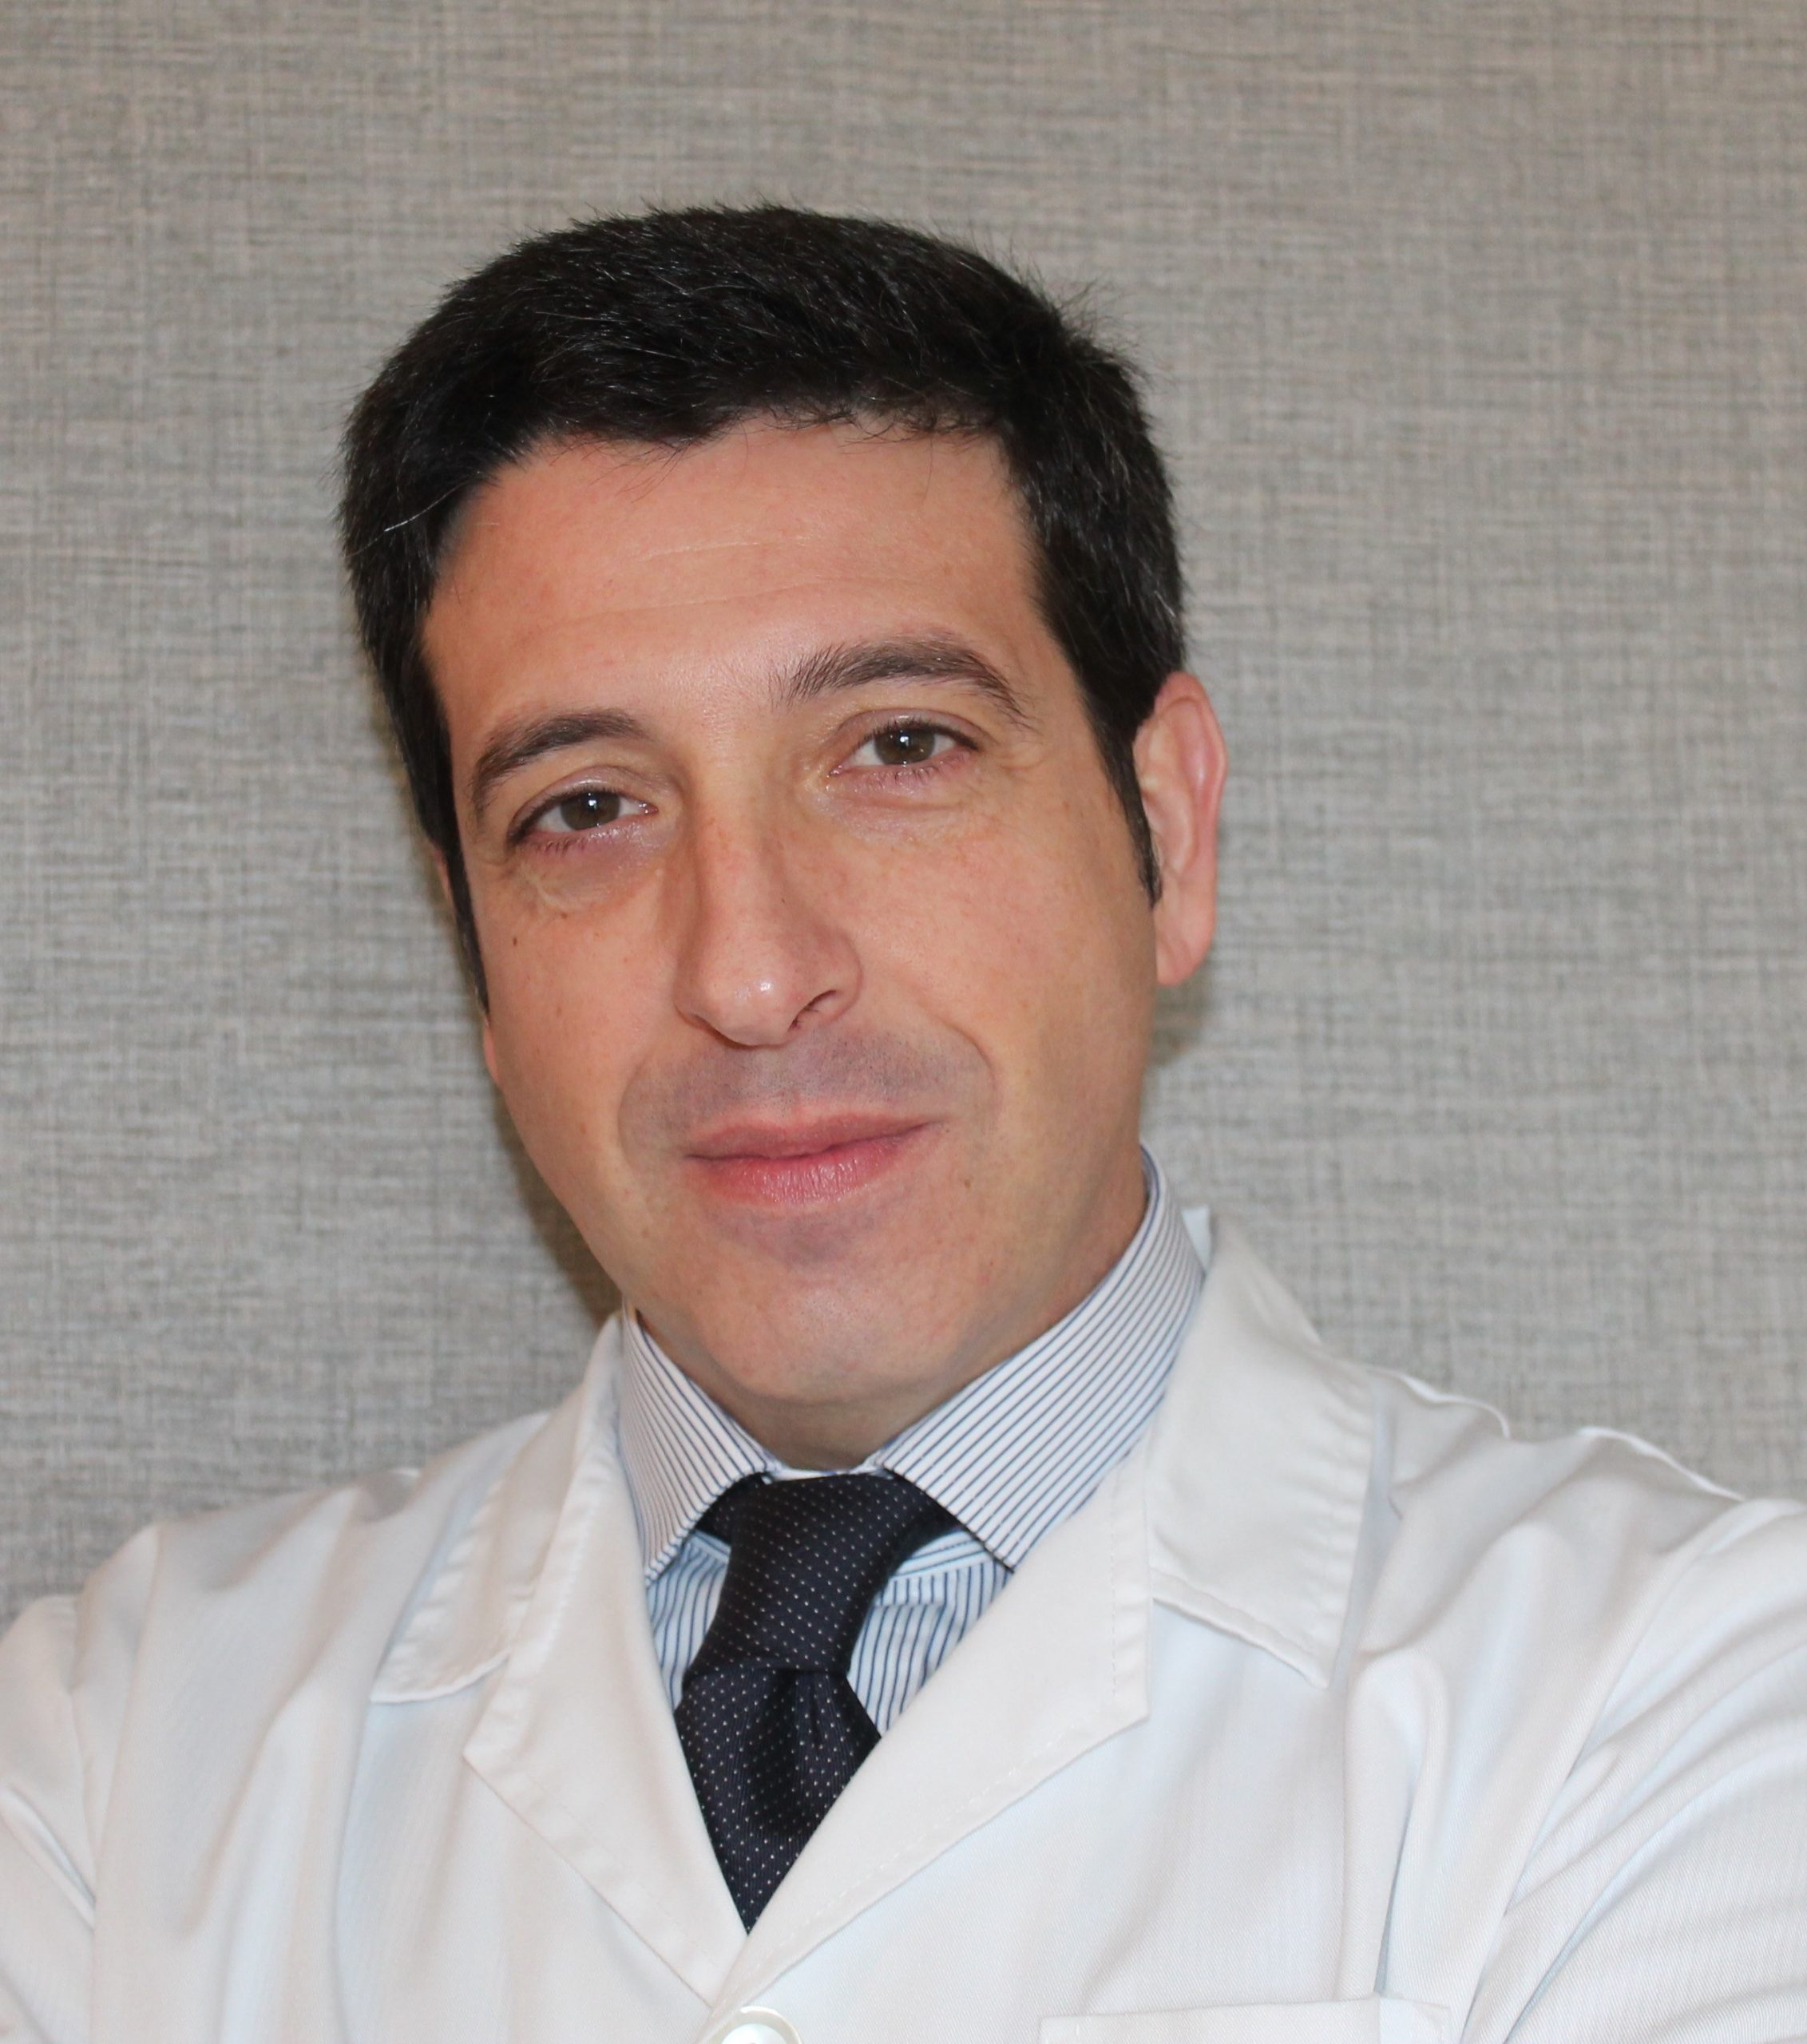 Dr. Nuno Neves